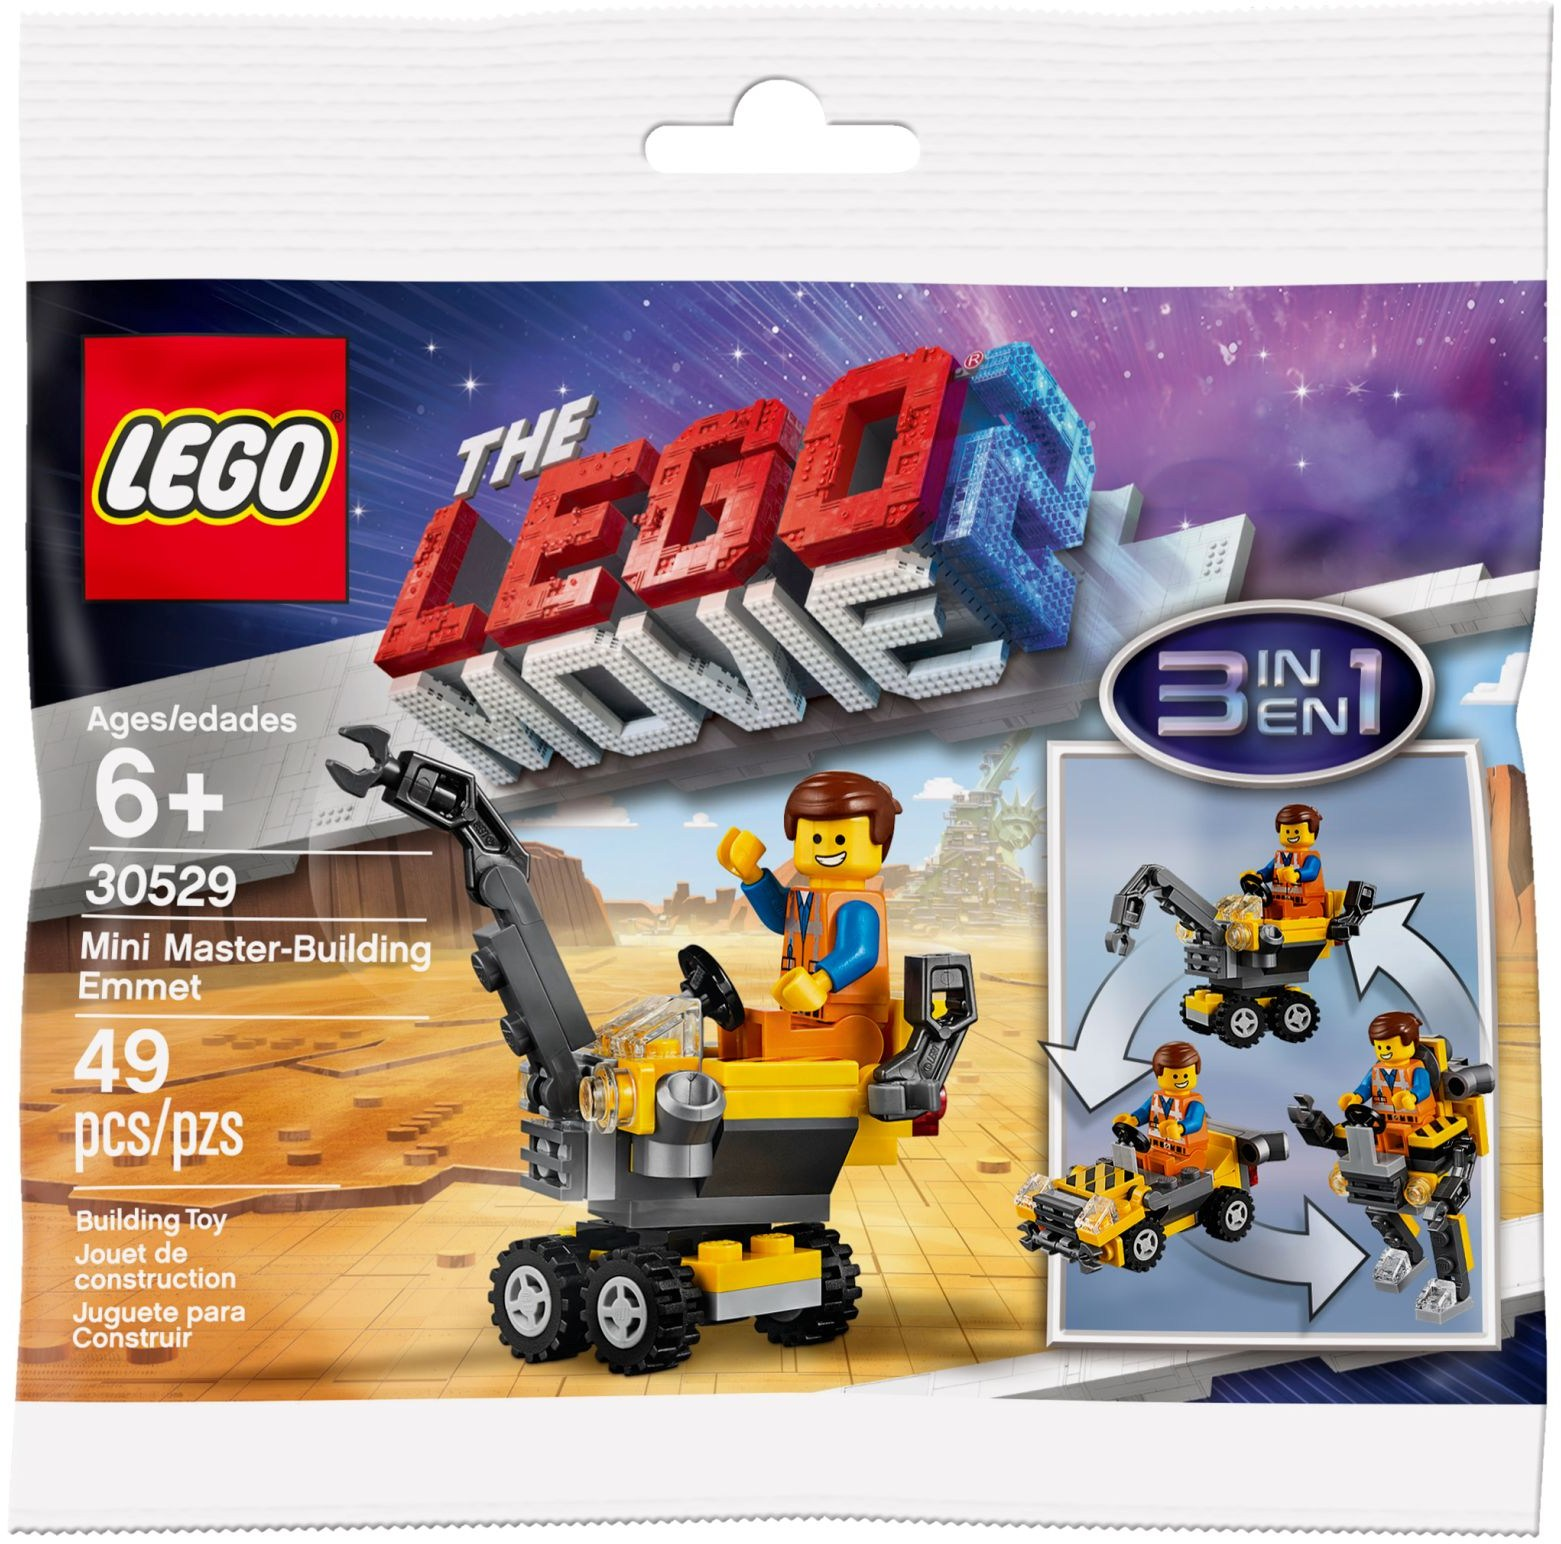 30529 Mini Master-Building Emmet